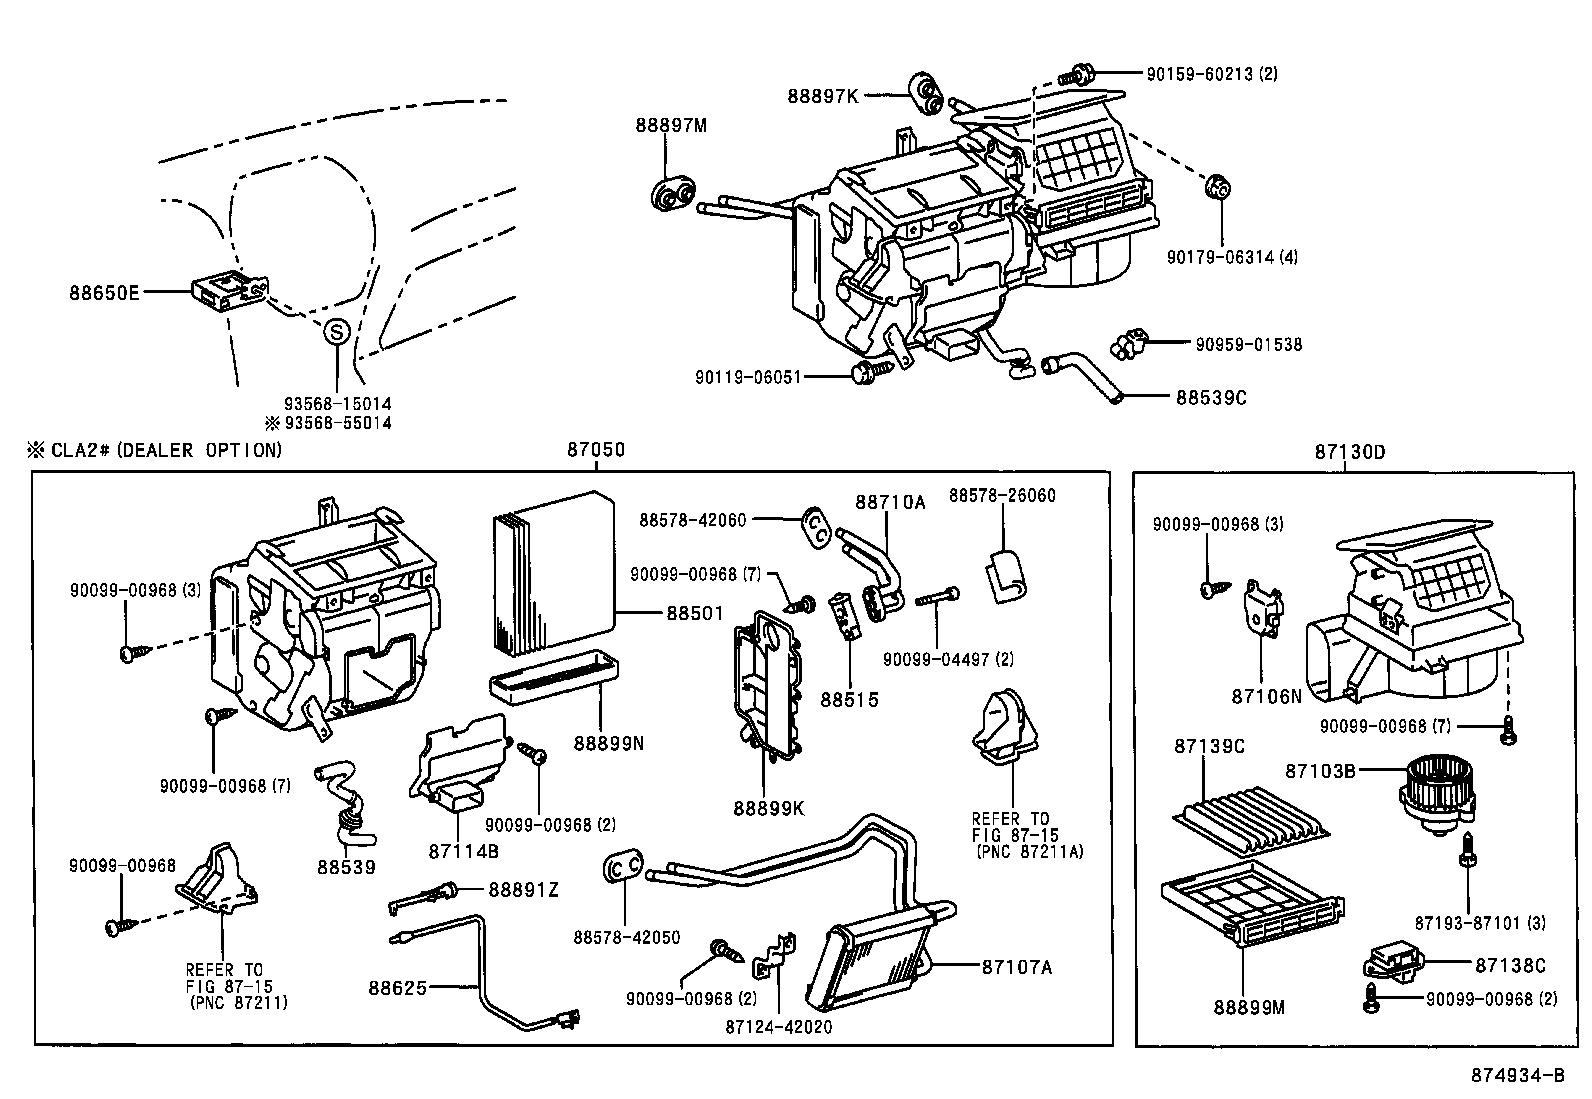 toyota rav4 parts diagram 1995 ford 7 3 diesel fuel system 2004 engine 2000 land cruiser